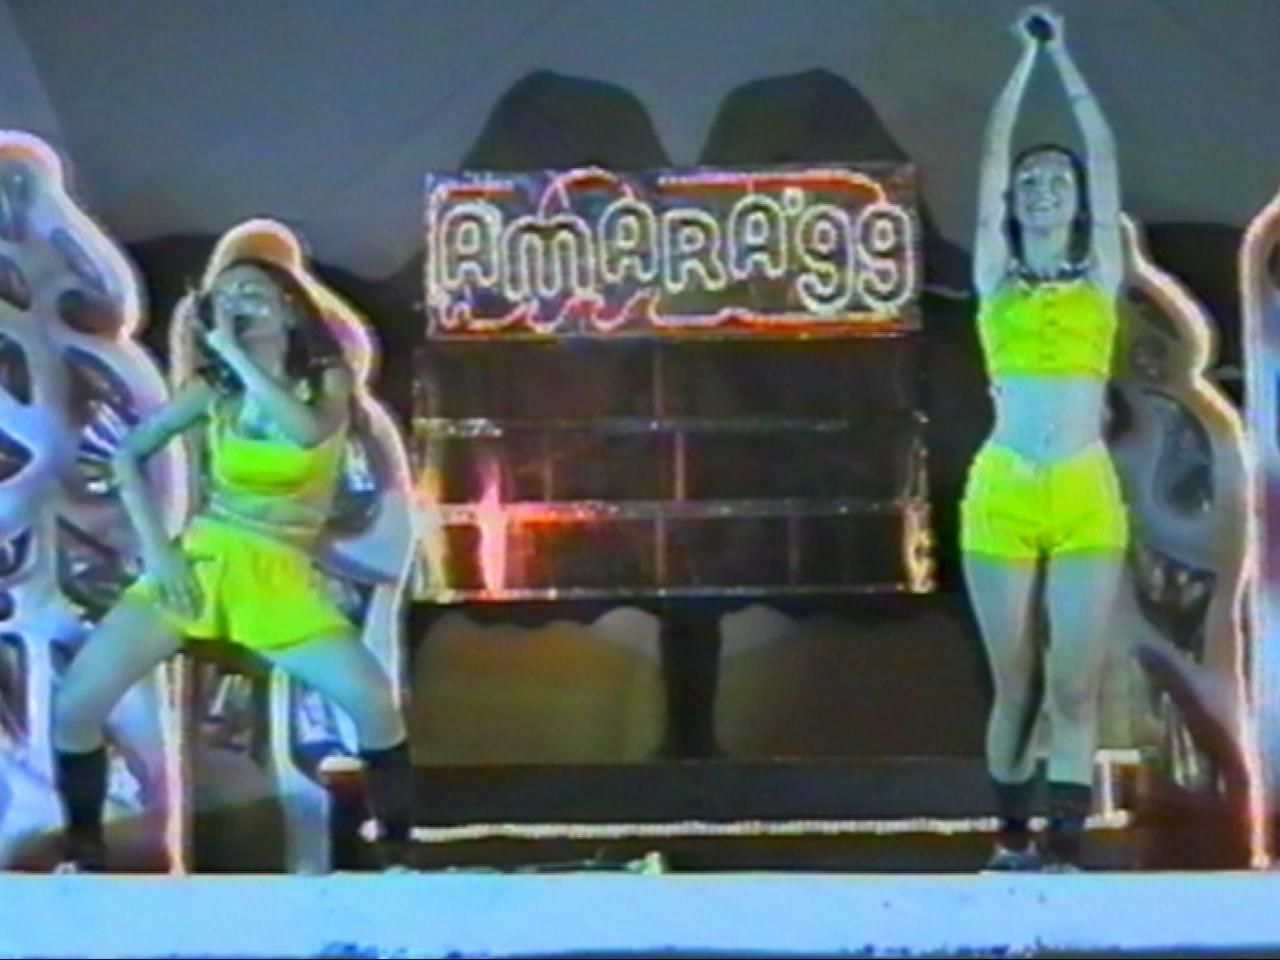 Amara 1999 - Andre.jpg